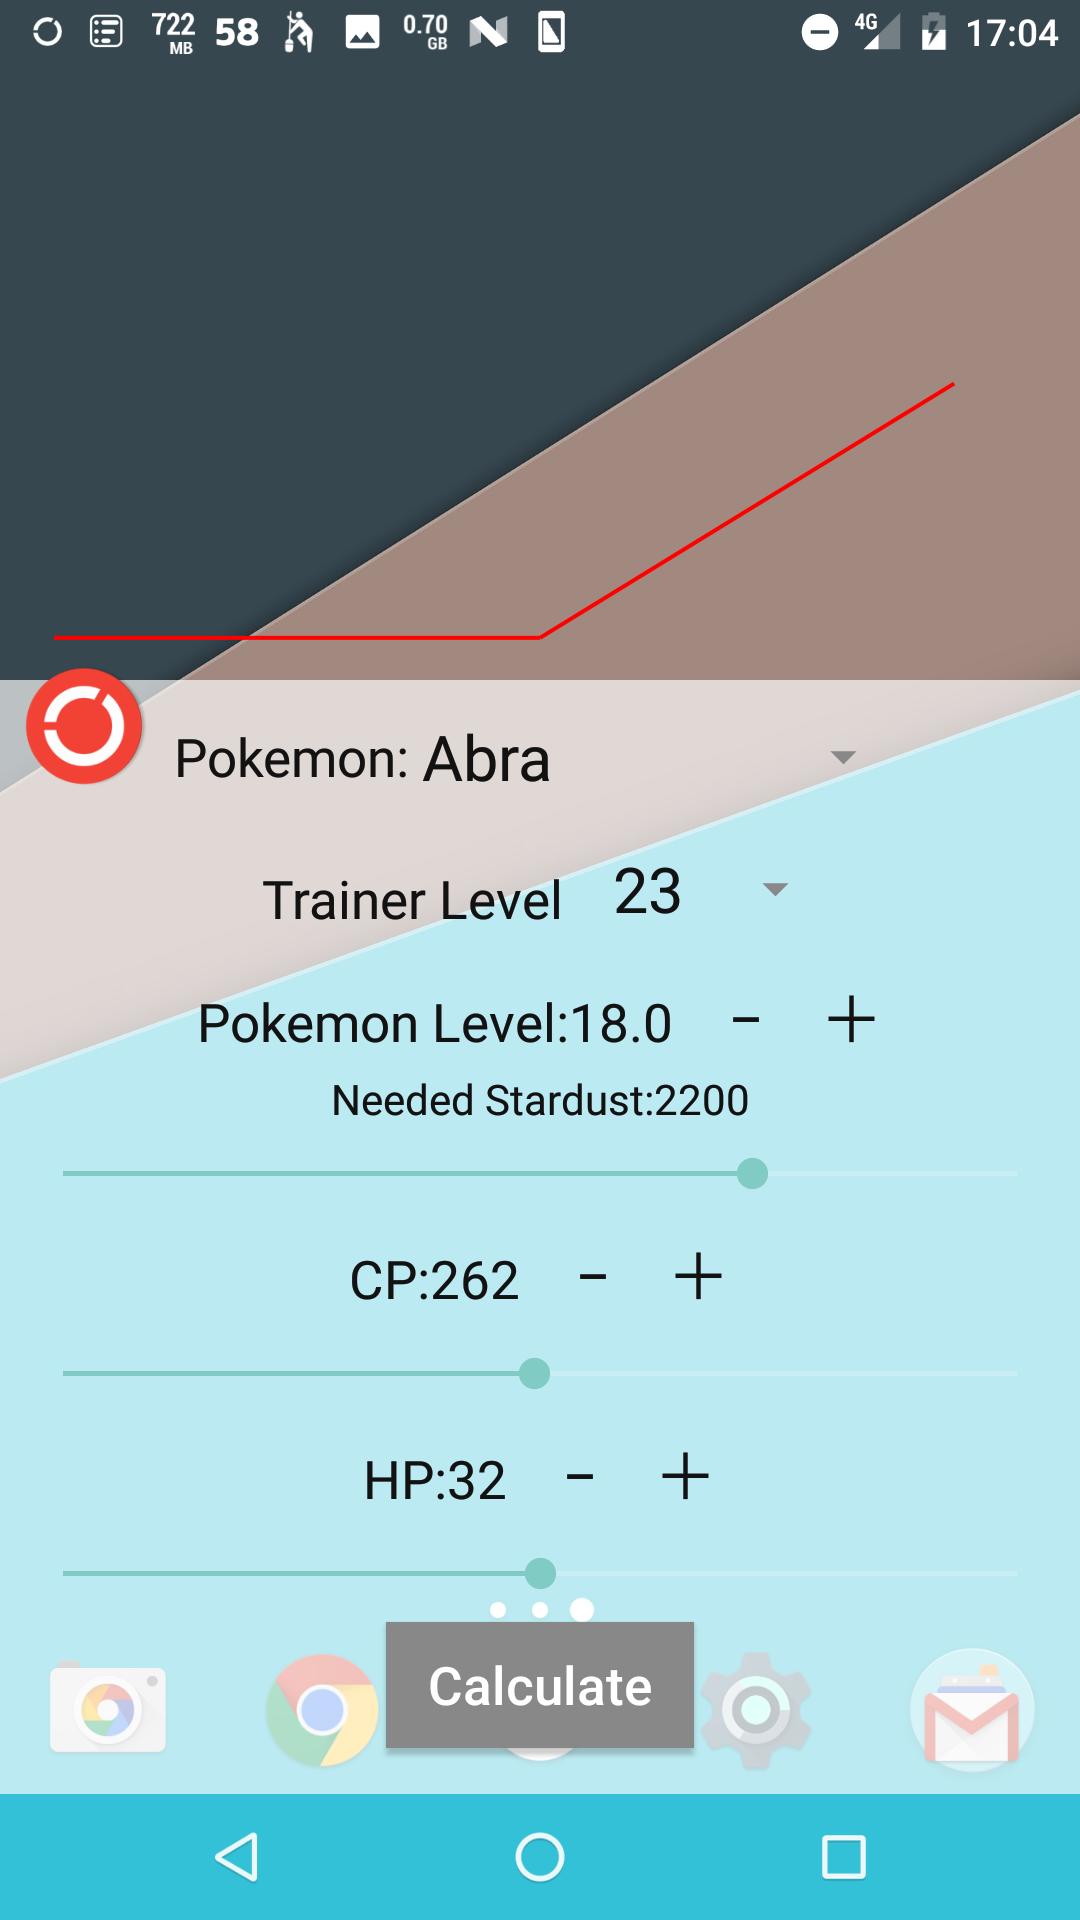 IV Calculator for Pokémon GO [Unofficial]